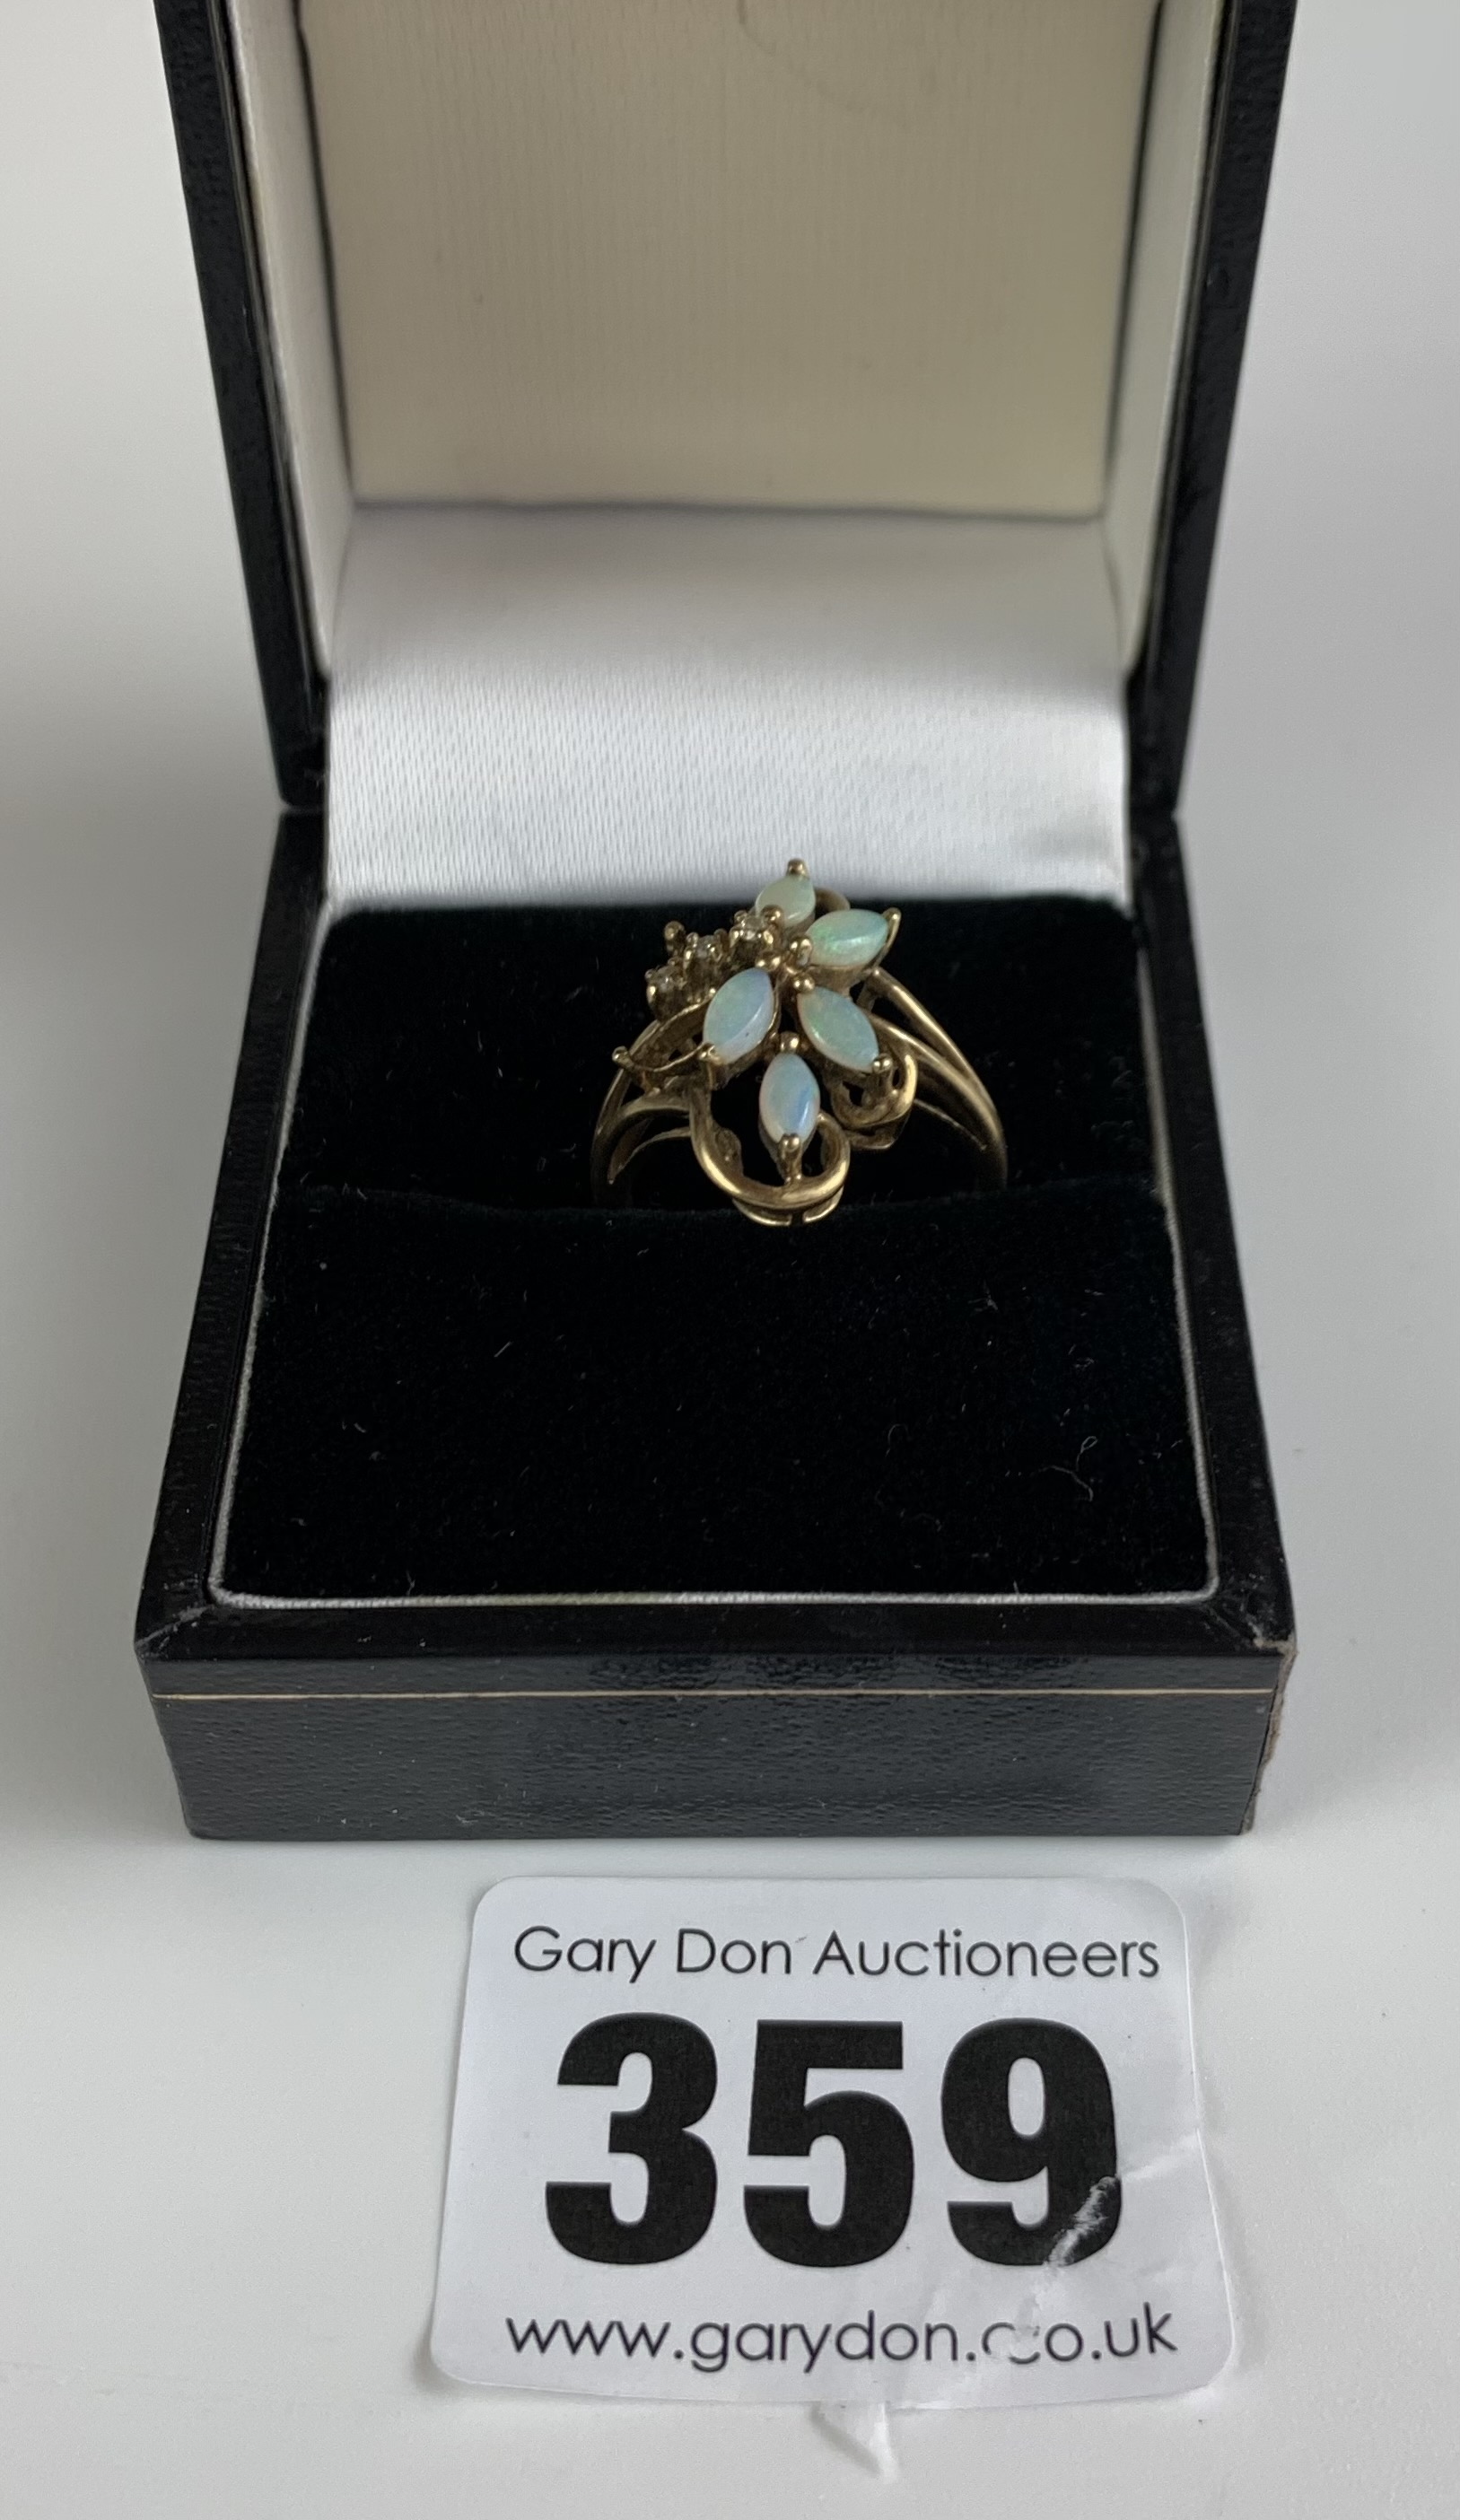 9k gold ring with opal flower design, size K, w: 2.6 gms